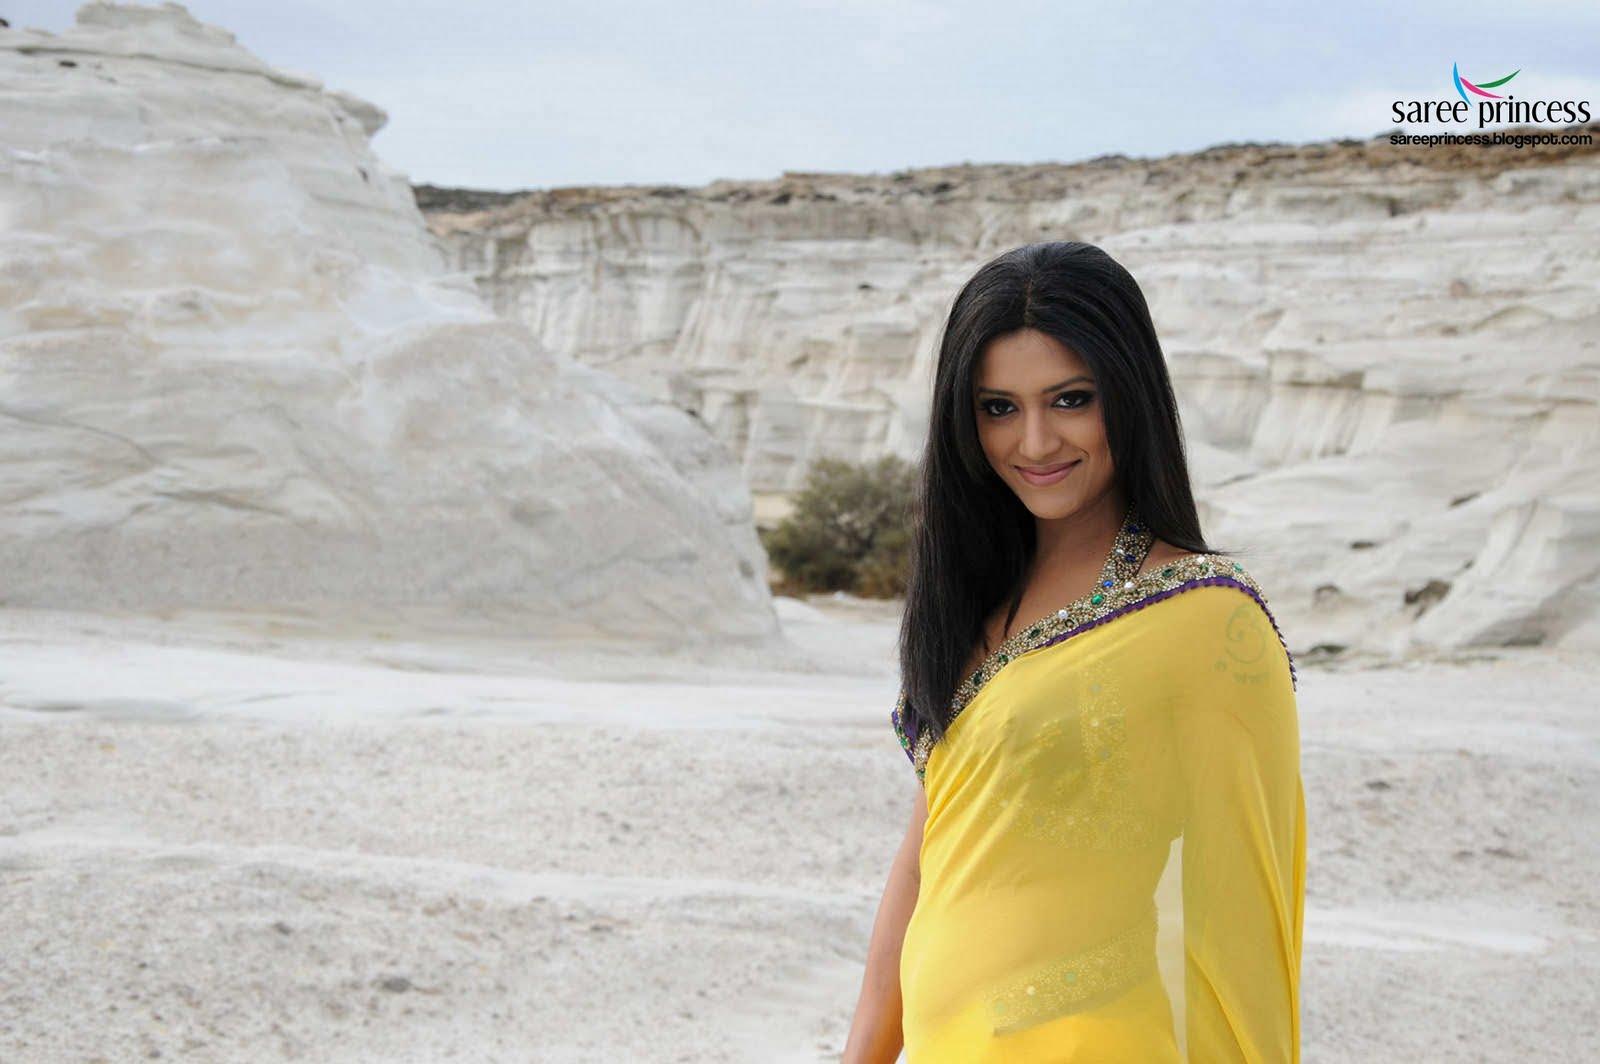 http://3.bp.blogspot.com/-Dm4N2EQPOkE/Tj72T-1XknI/AAAAAAAAEJQ/fSgDeZC17ng/s1600/mamtha-mohandas-yellow-saree-movie-still.jpg